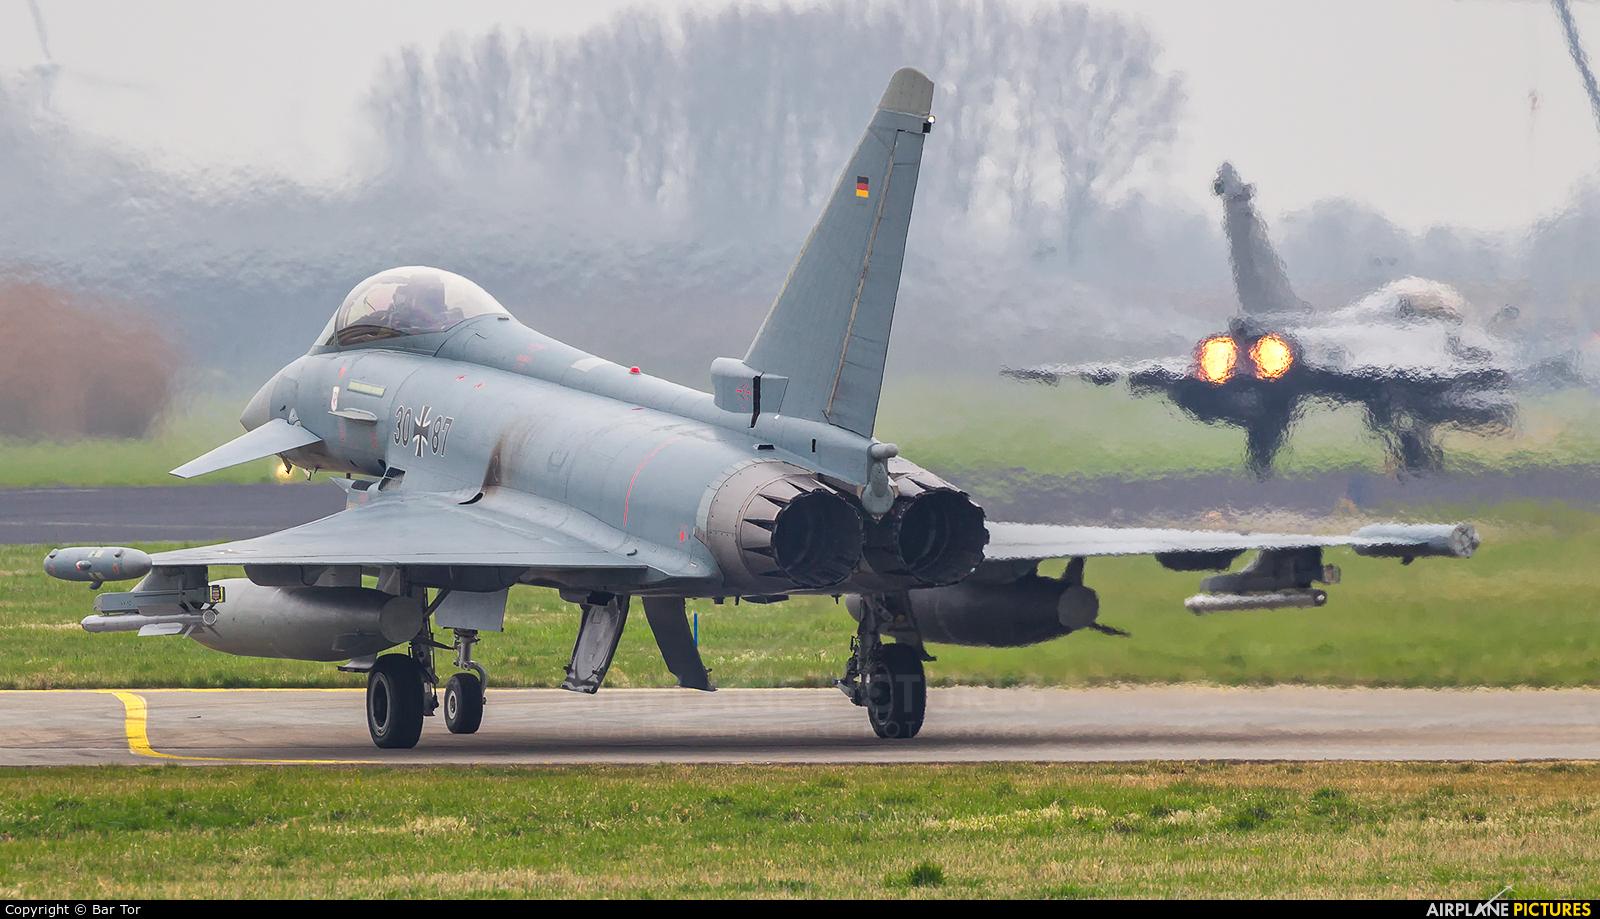 Germany - Air Force 30+87 aircraft at Leeuwarden